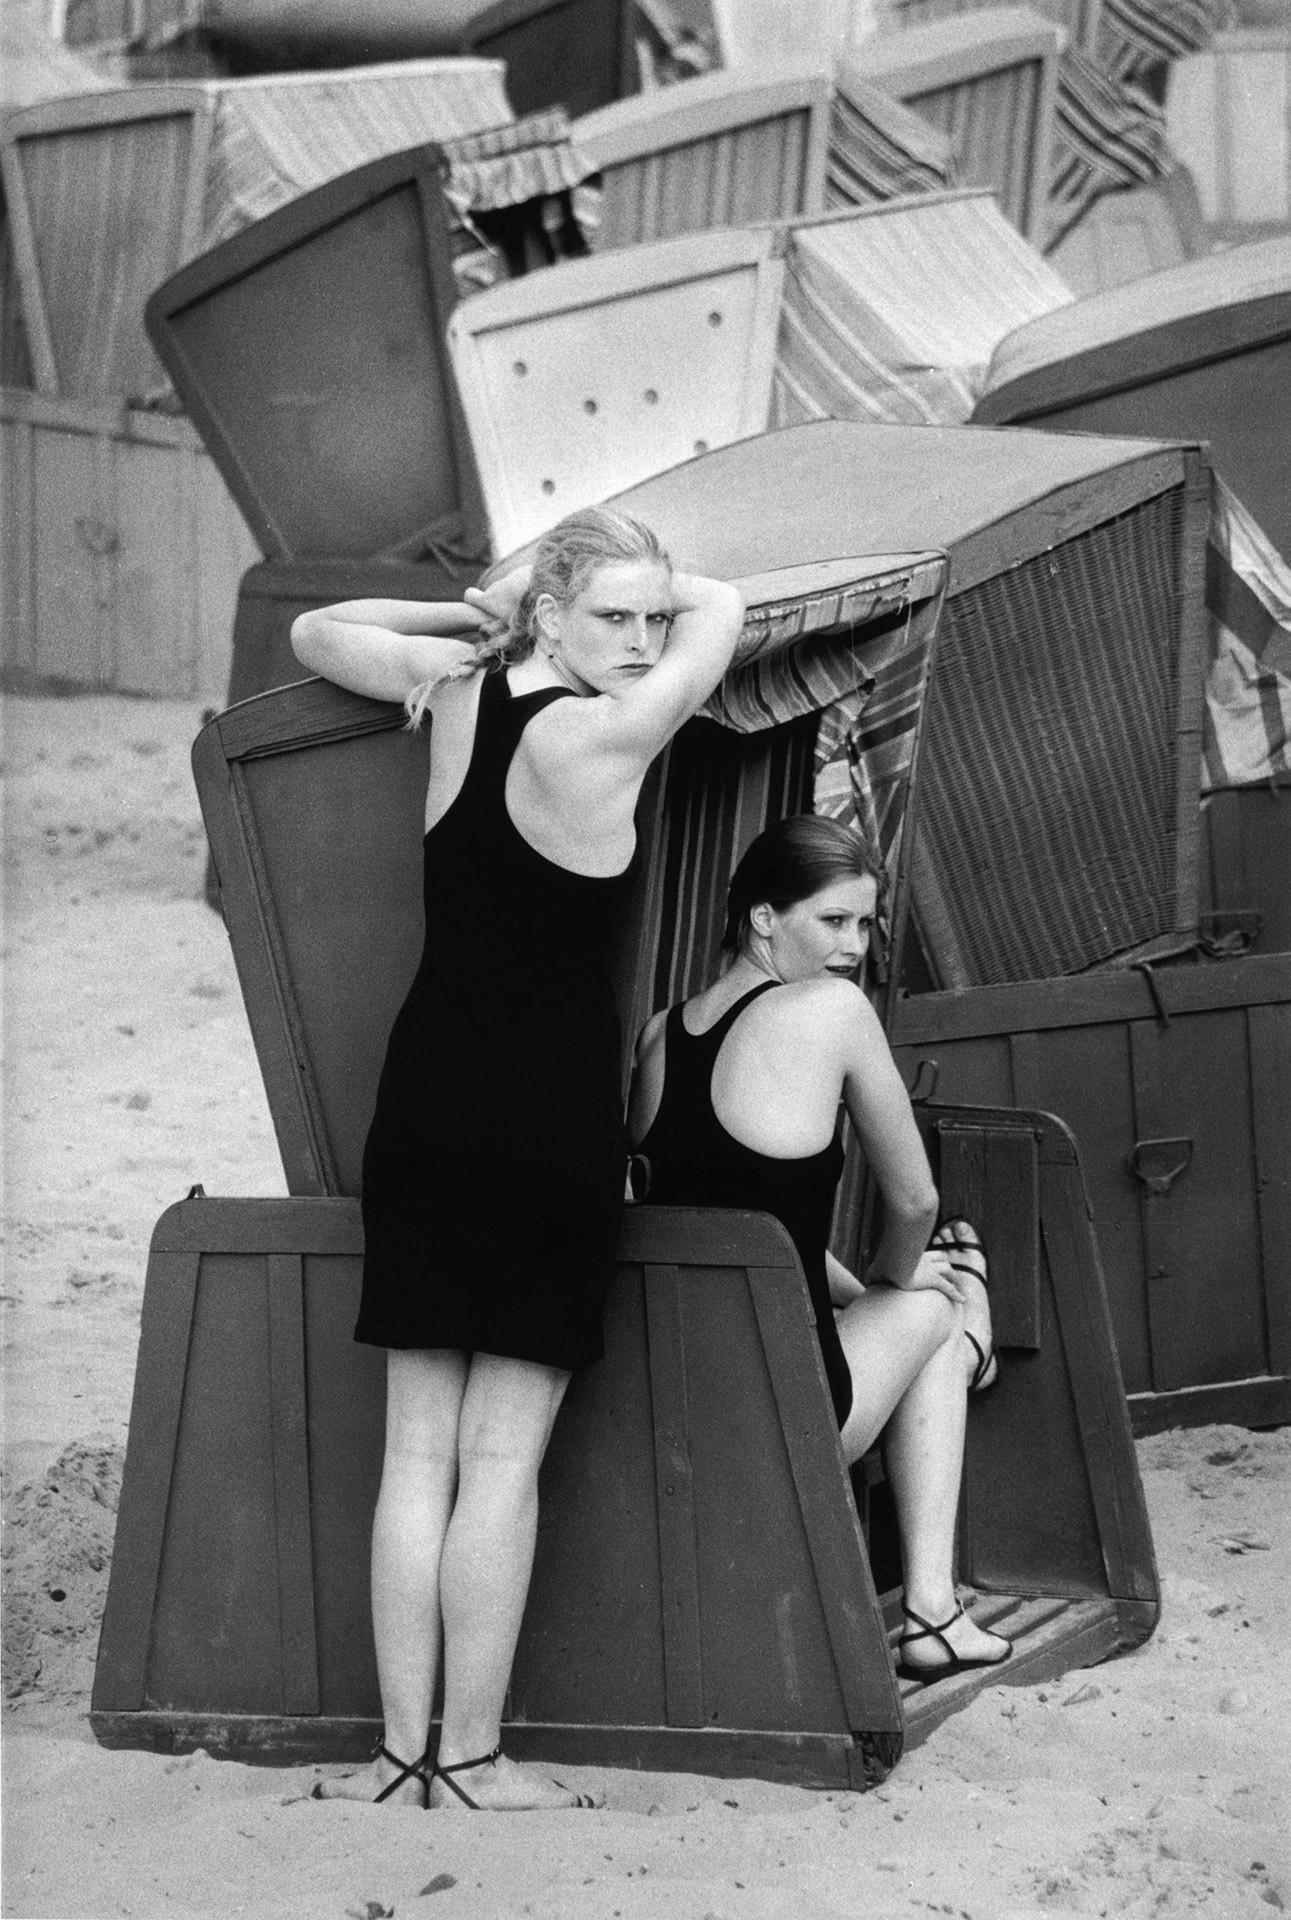 Мариза и Лиане, Зеллин, 1981. Фотограф Сибилла Бергеман